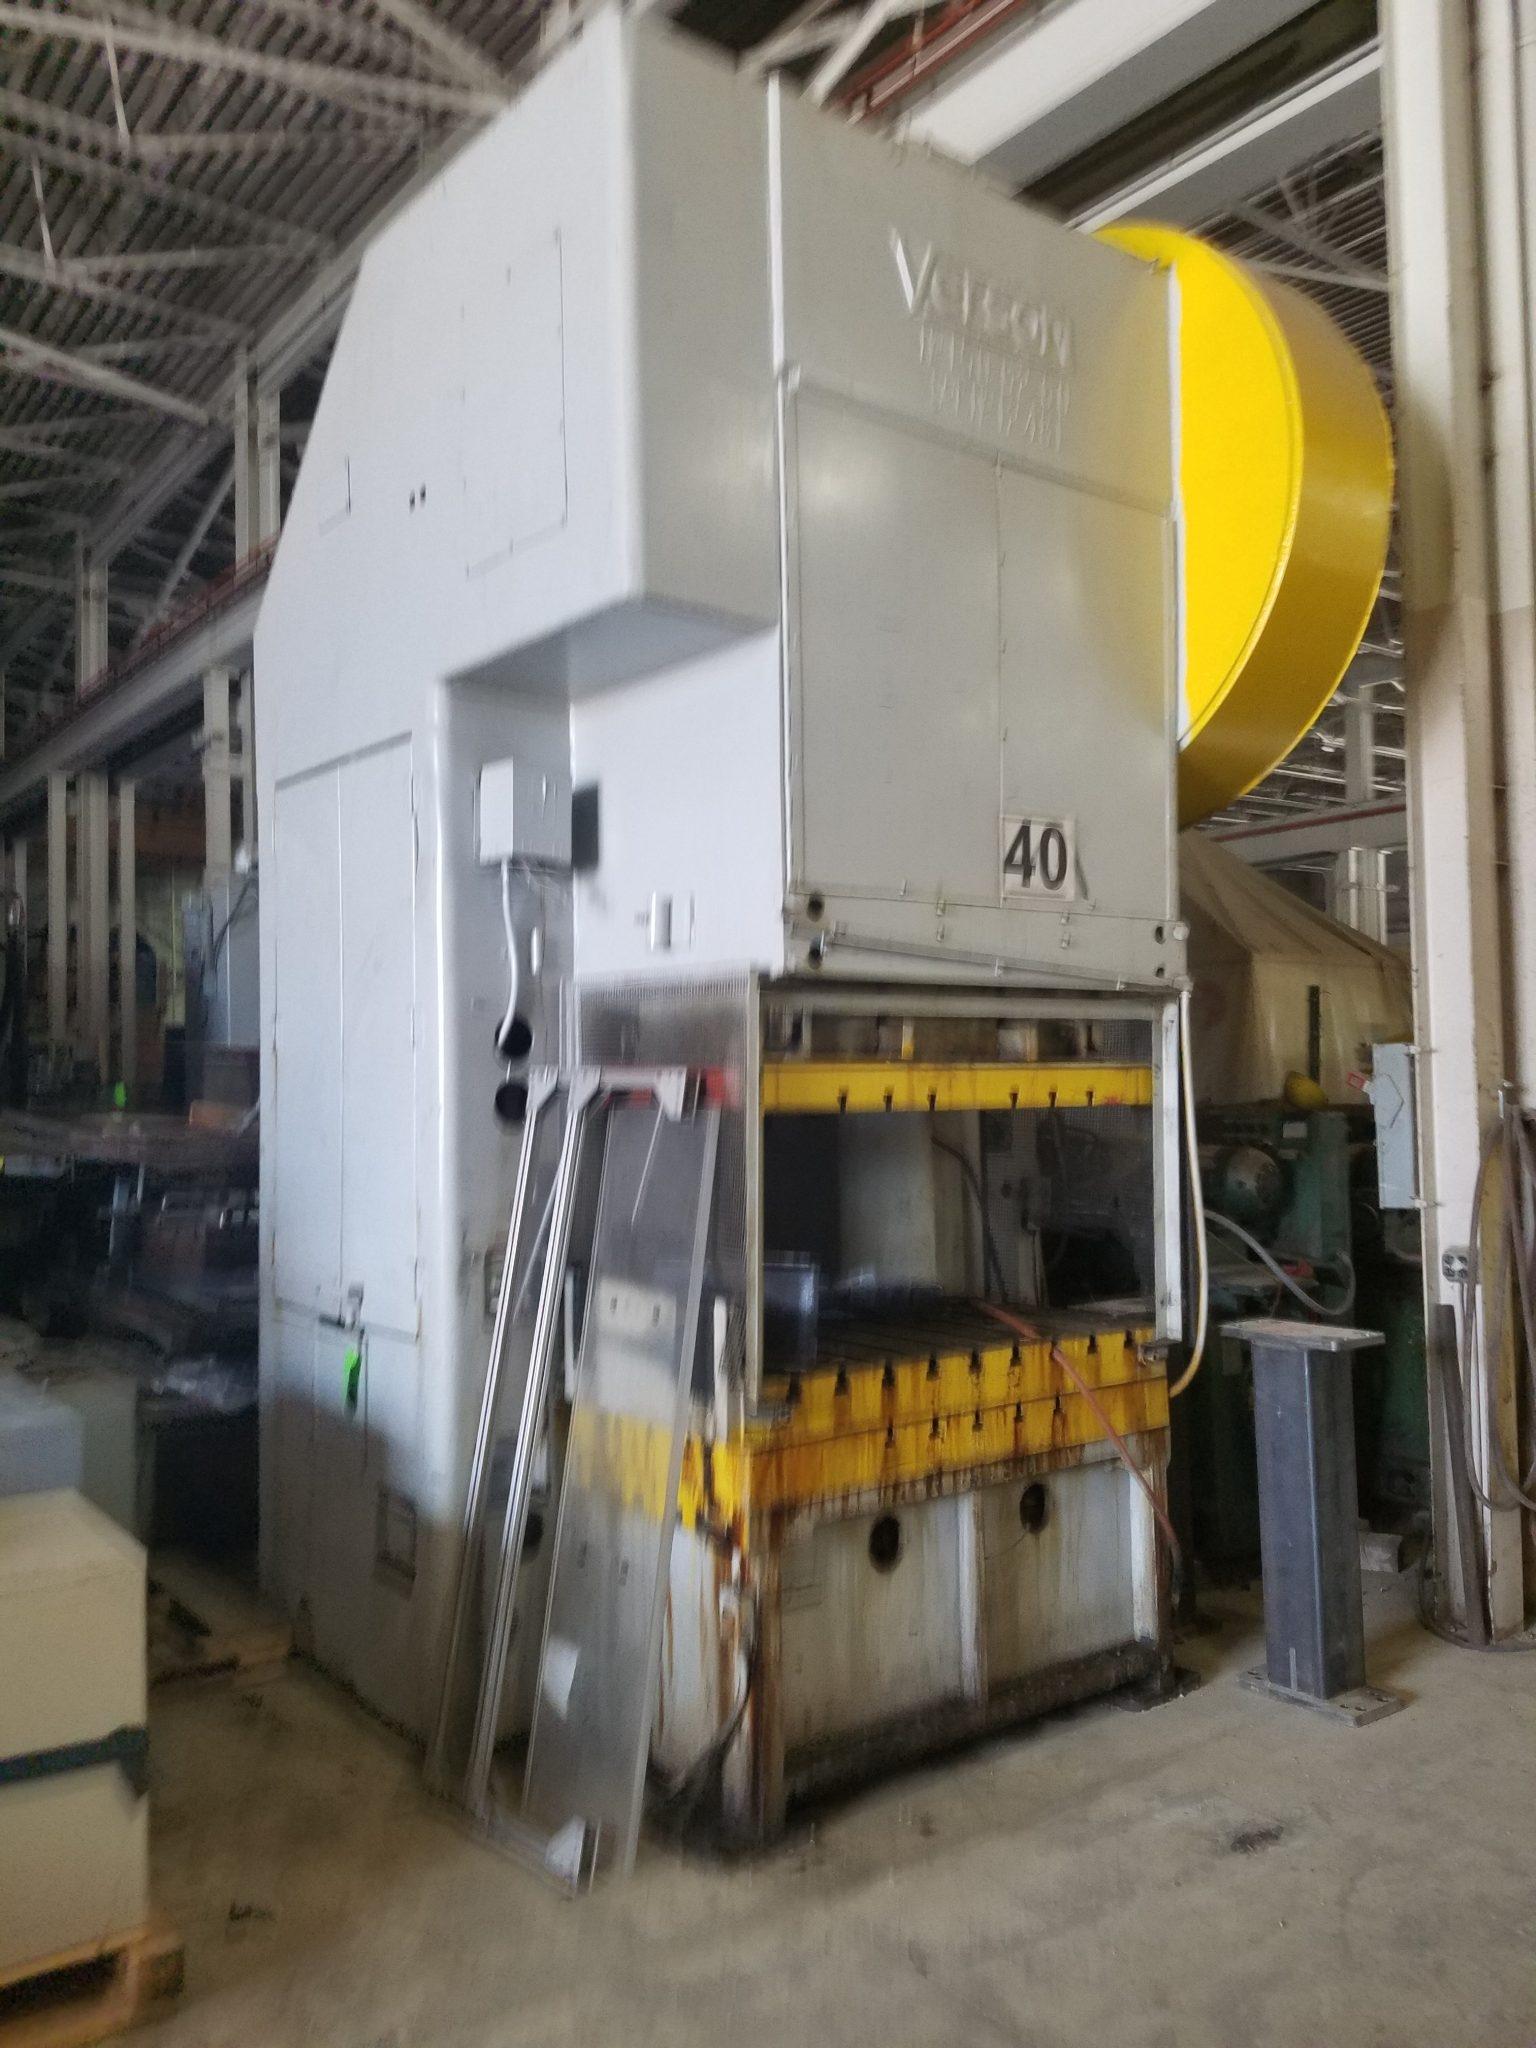 150 Ton Capacity Verson Gap-Frame Press For Sale